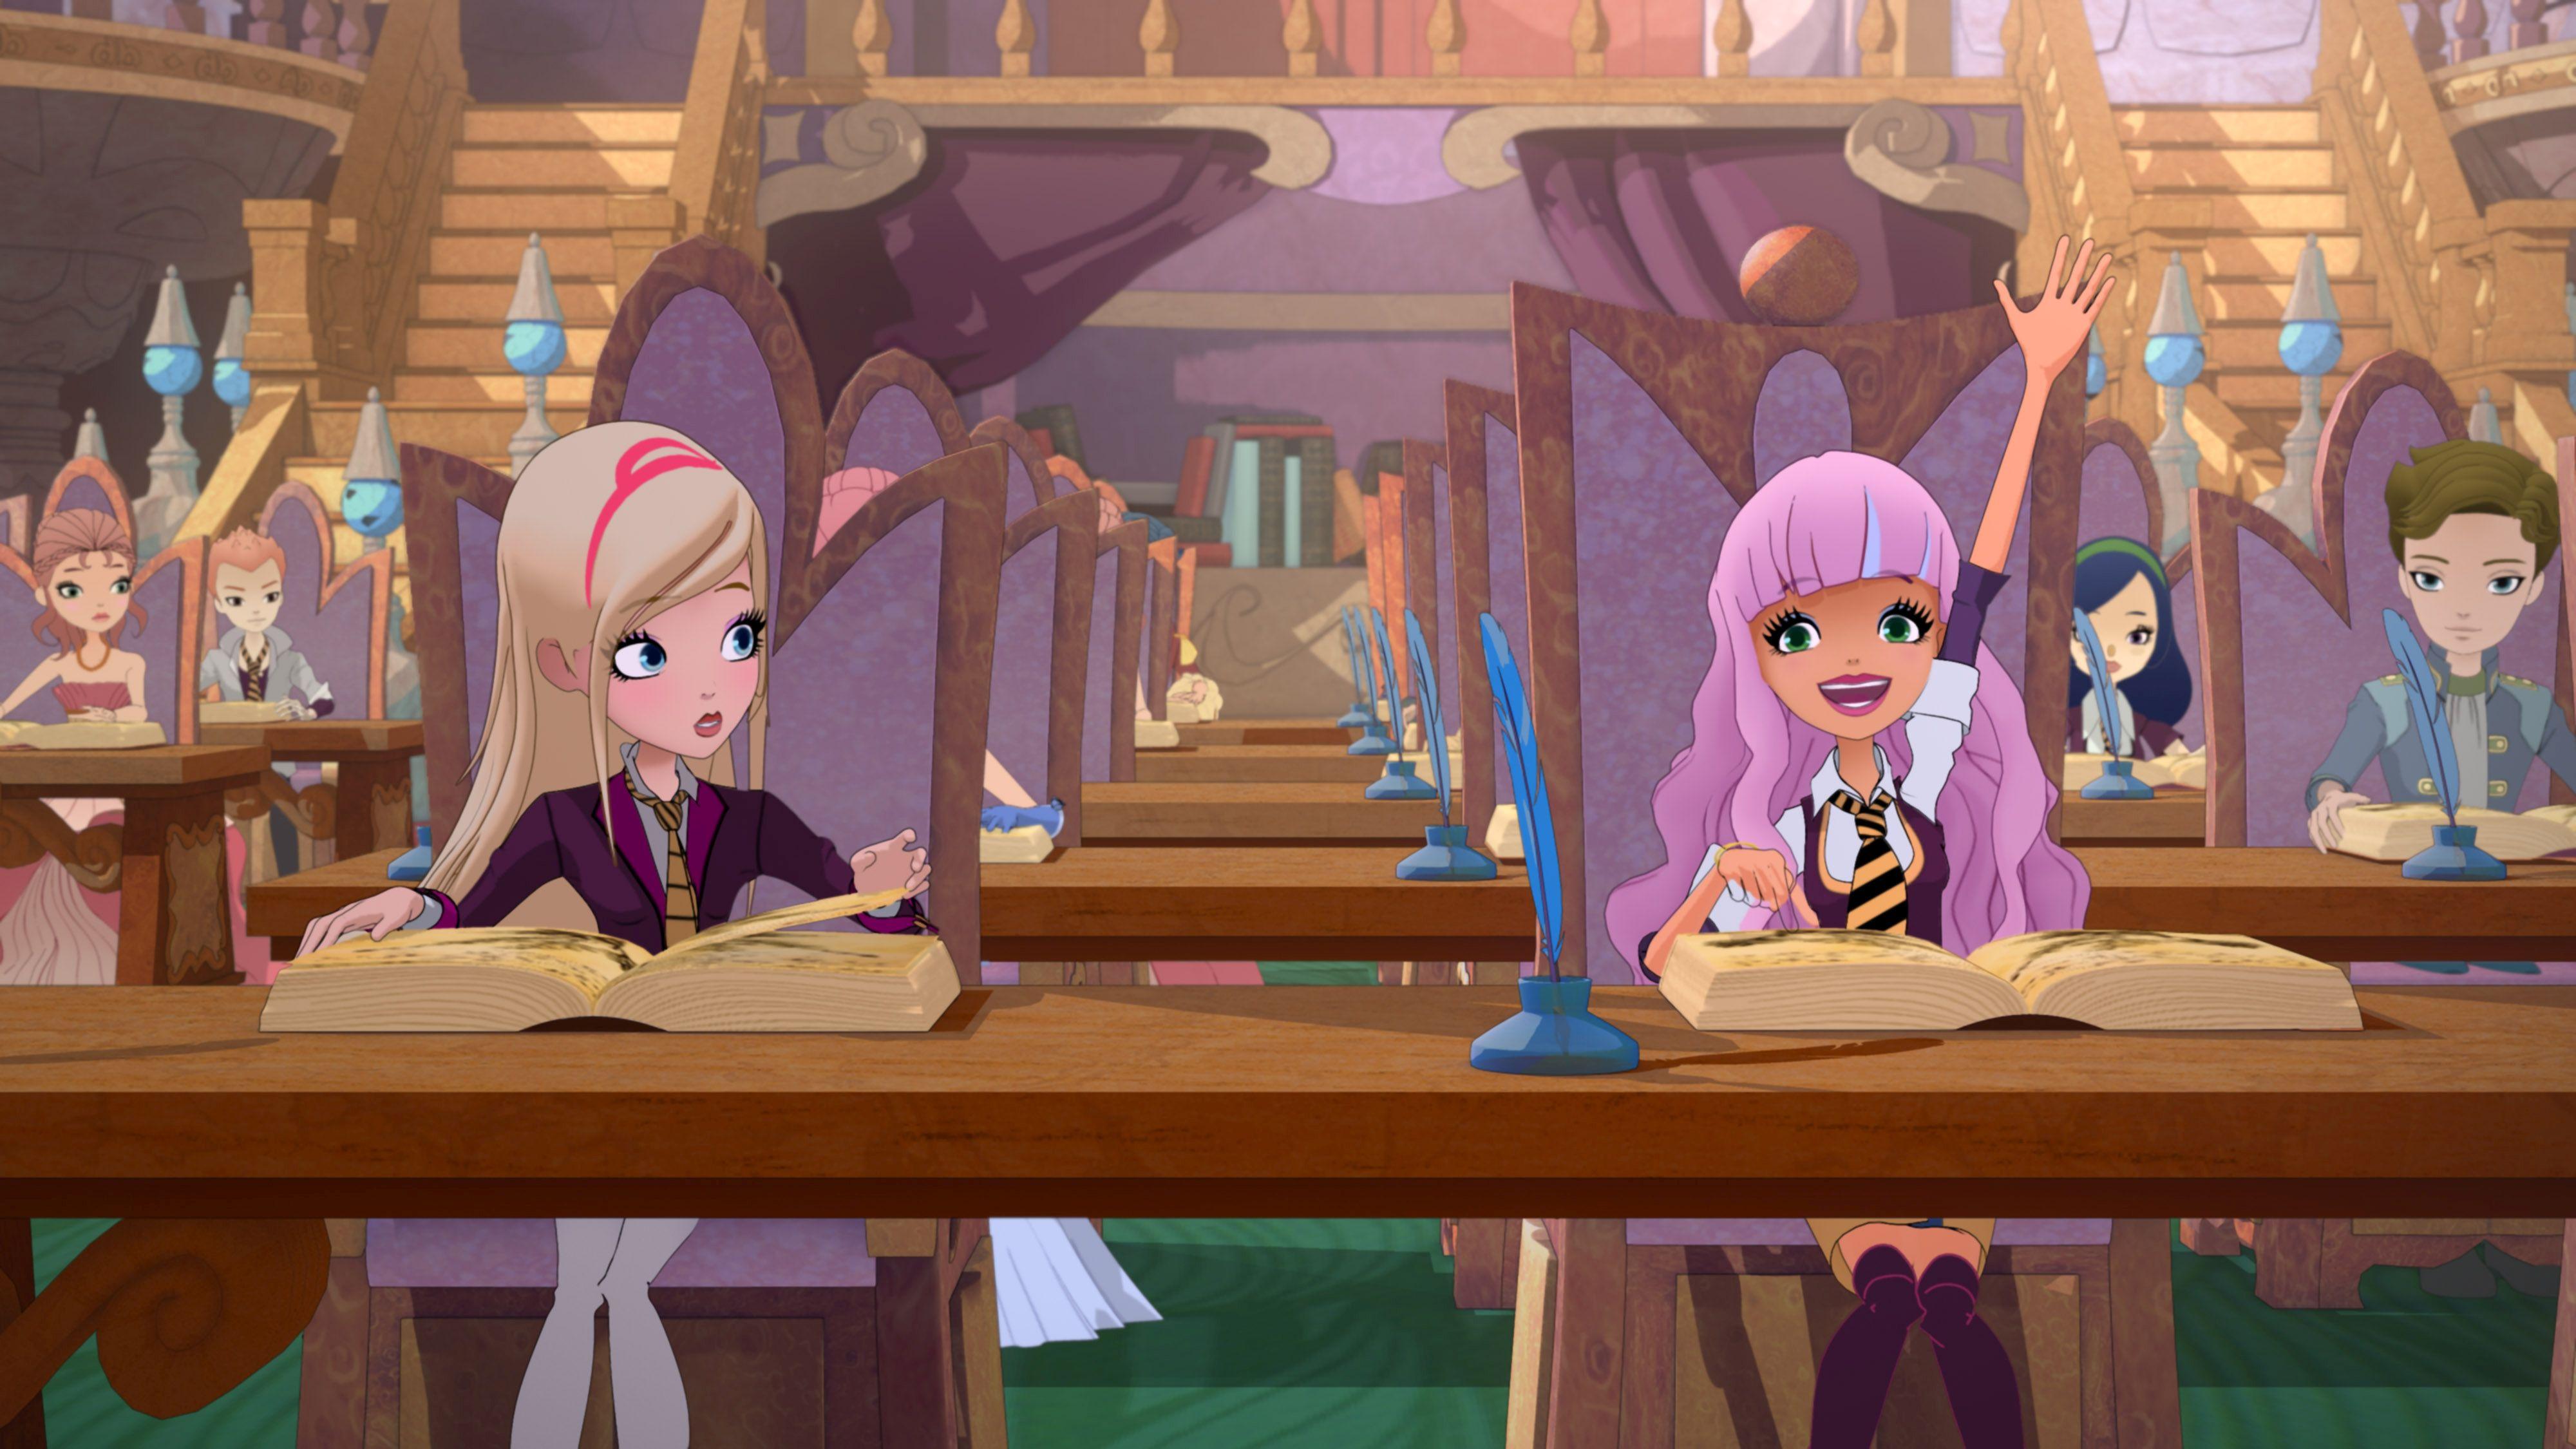 Ragal Academy: una scena della serie animata targata Rainbow